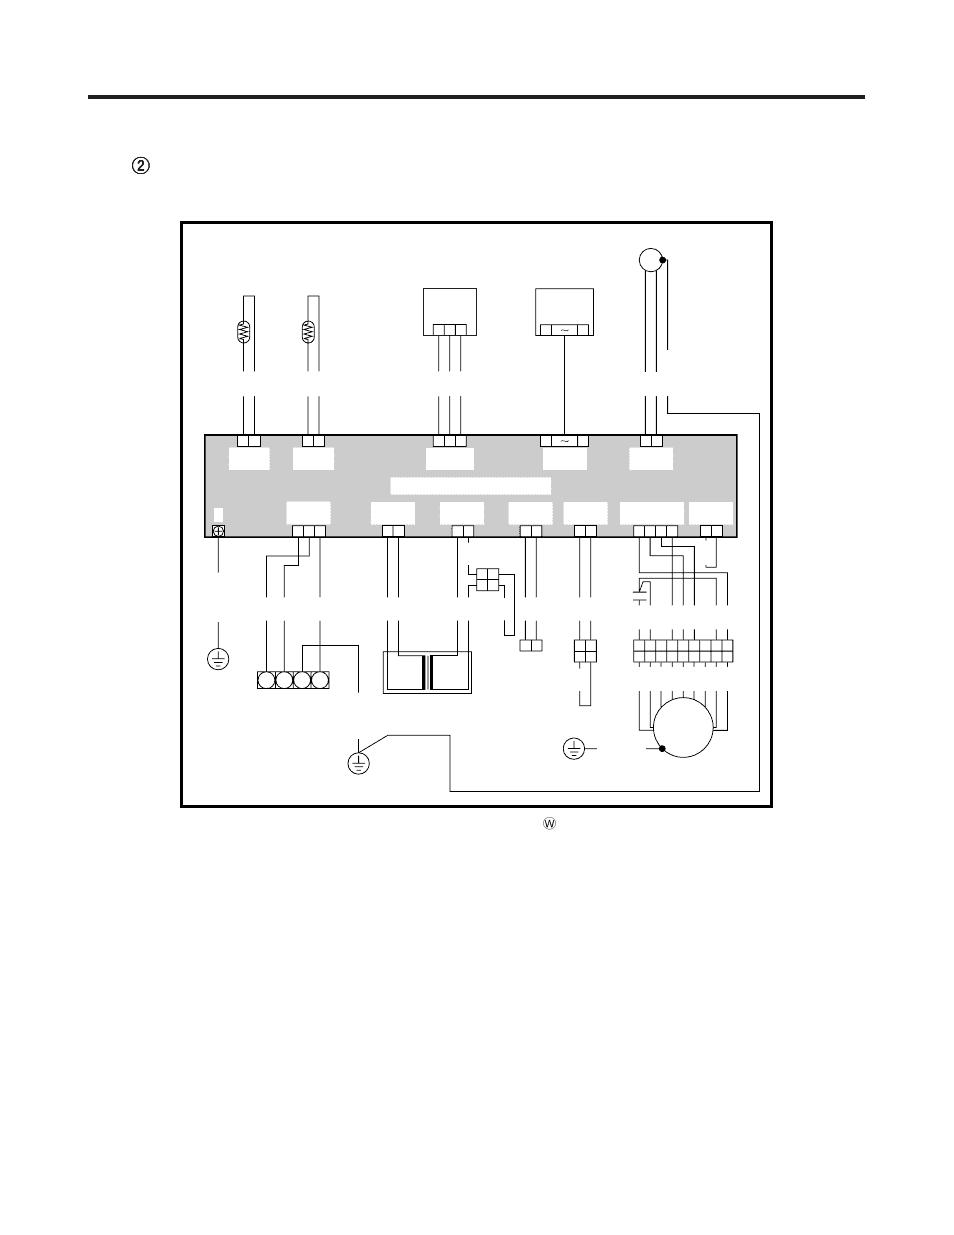 2003 Mazda B3000 Wiring Diagram